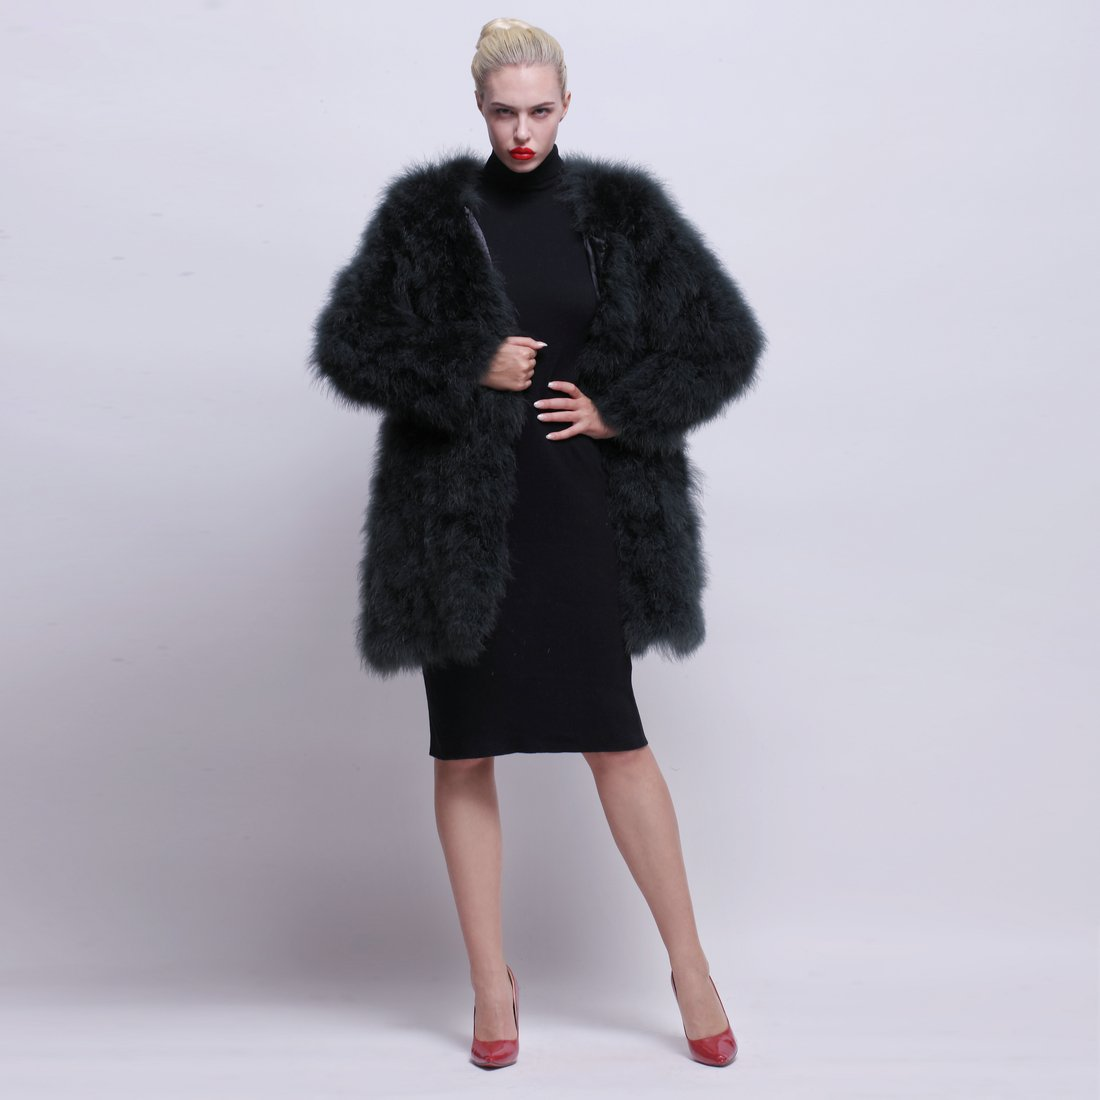 URSFUR Women Winter Jacket Real Ostrich Feather Fur Coat Opal Green XL by URSFUR (Image #5)